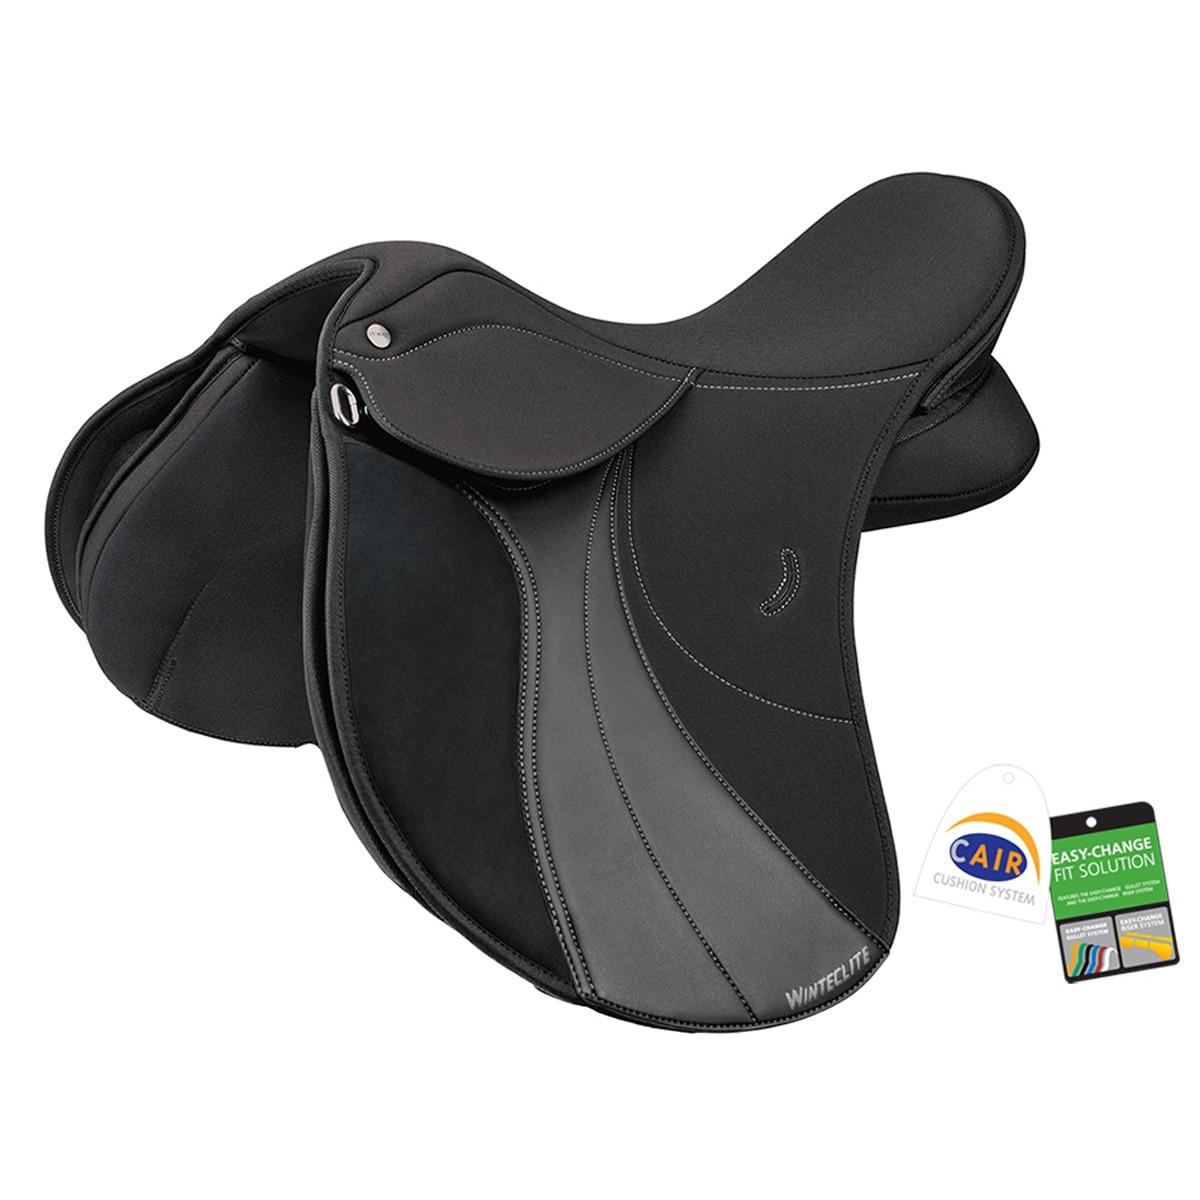 WintecLite Pony All Purpose saddle w/CAIR